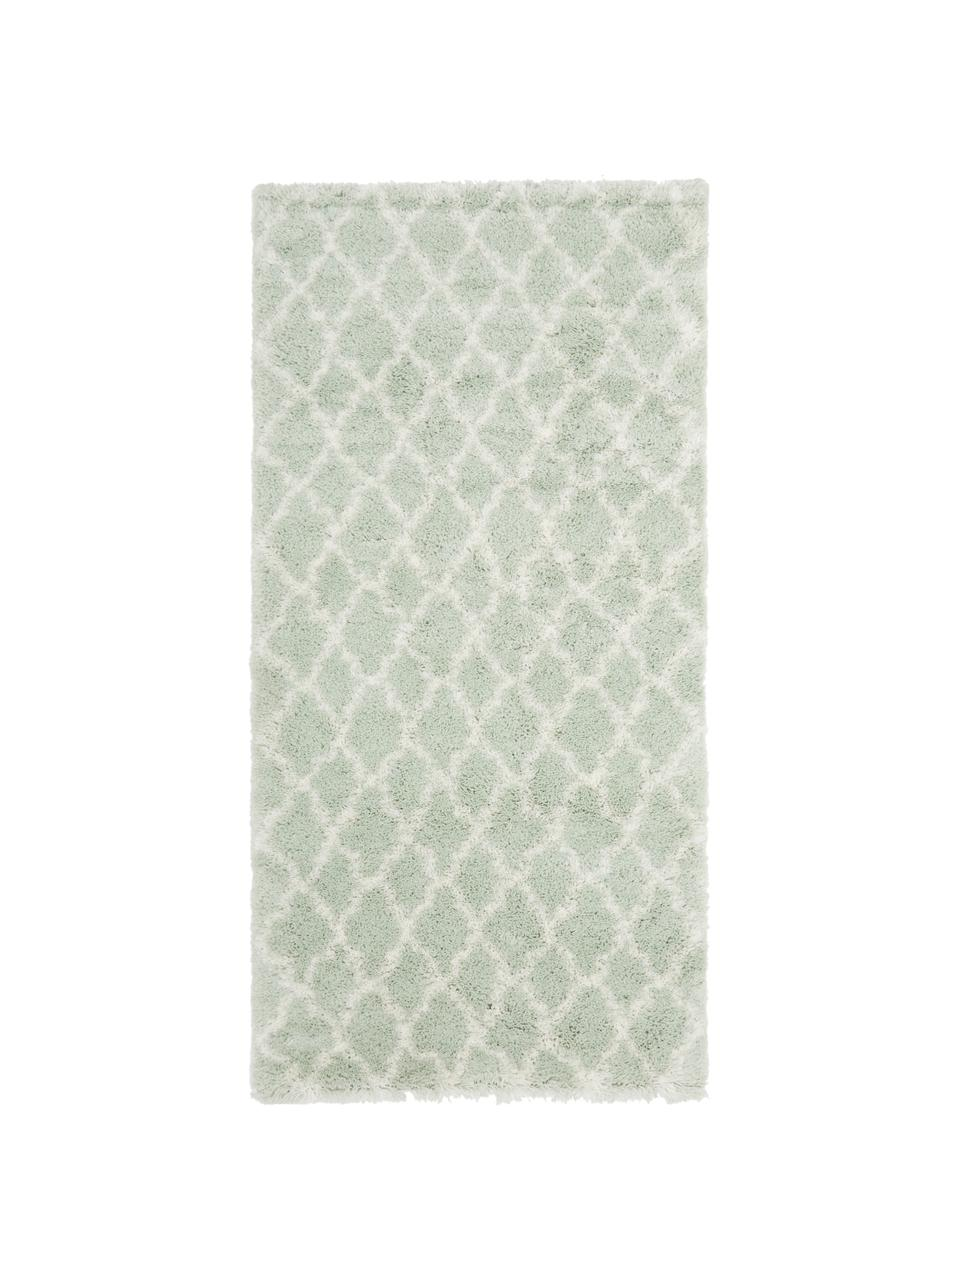 Tappeto a pelo lungo verde menta/bianco crema Mona, Retro: 78% juta, 14% cotone, 8% , Verde menta, bianco crema, Larg. 300 x Lung. 400 cm (taglia XL)